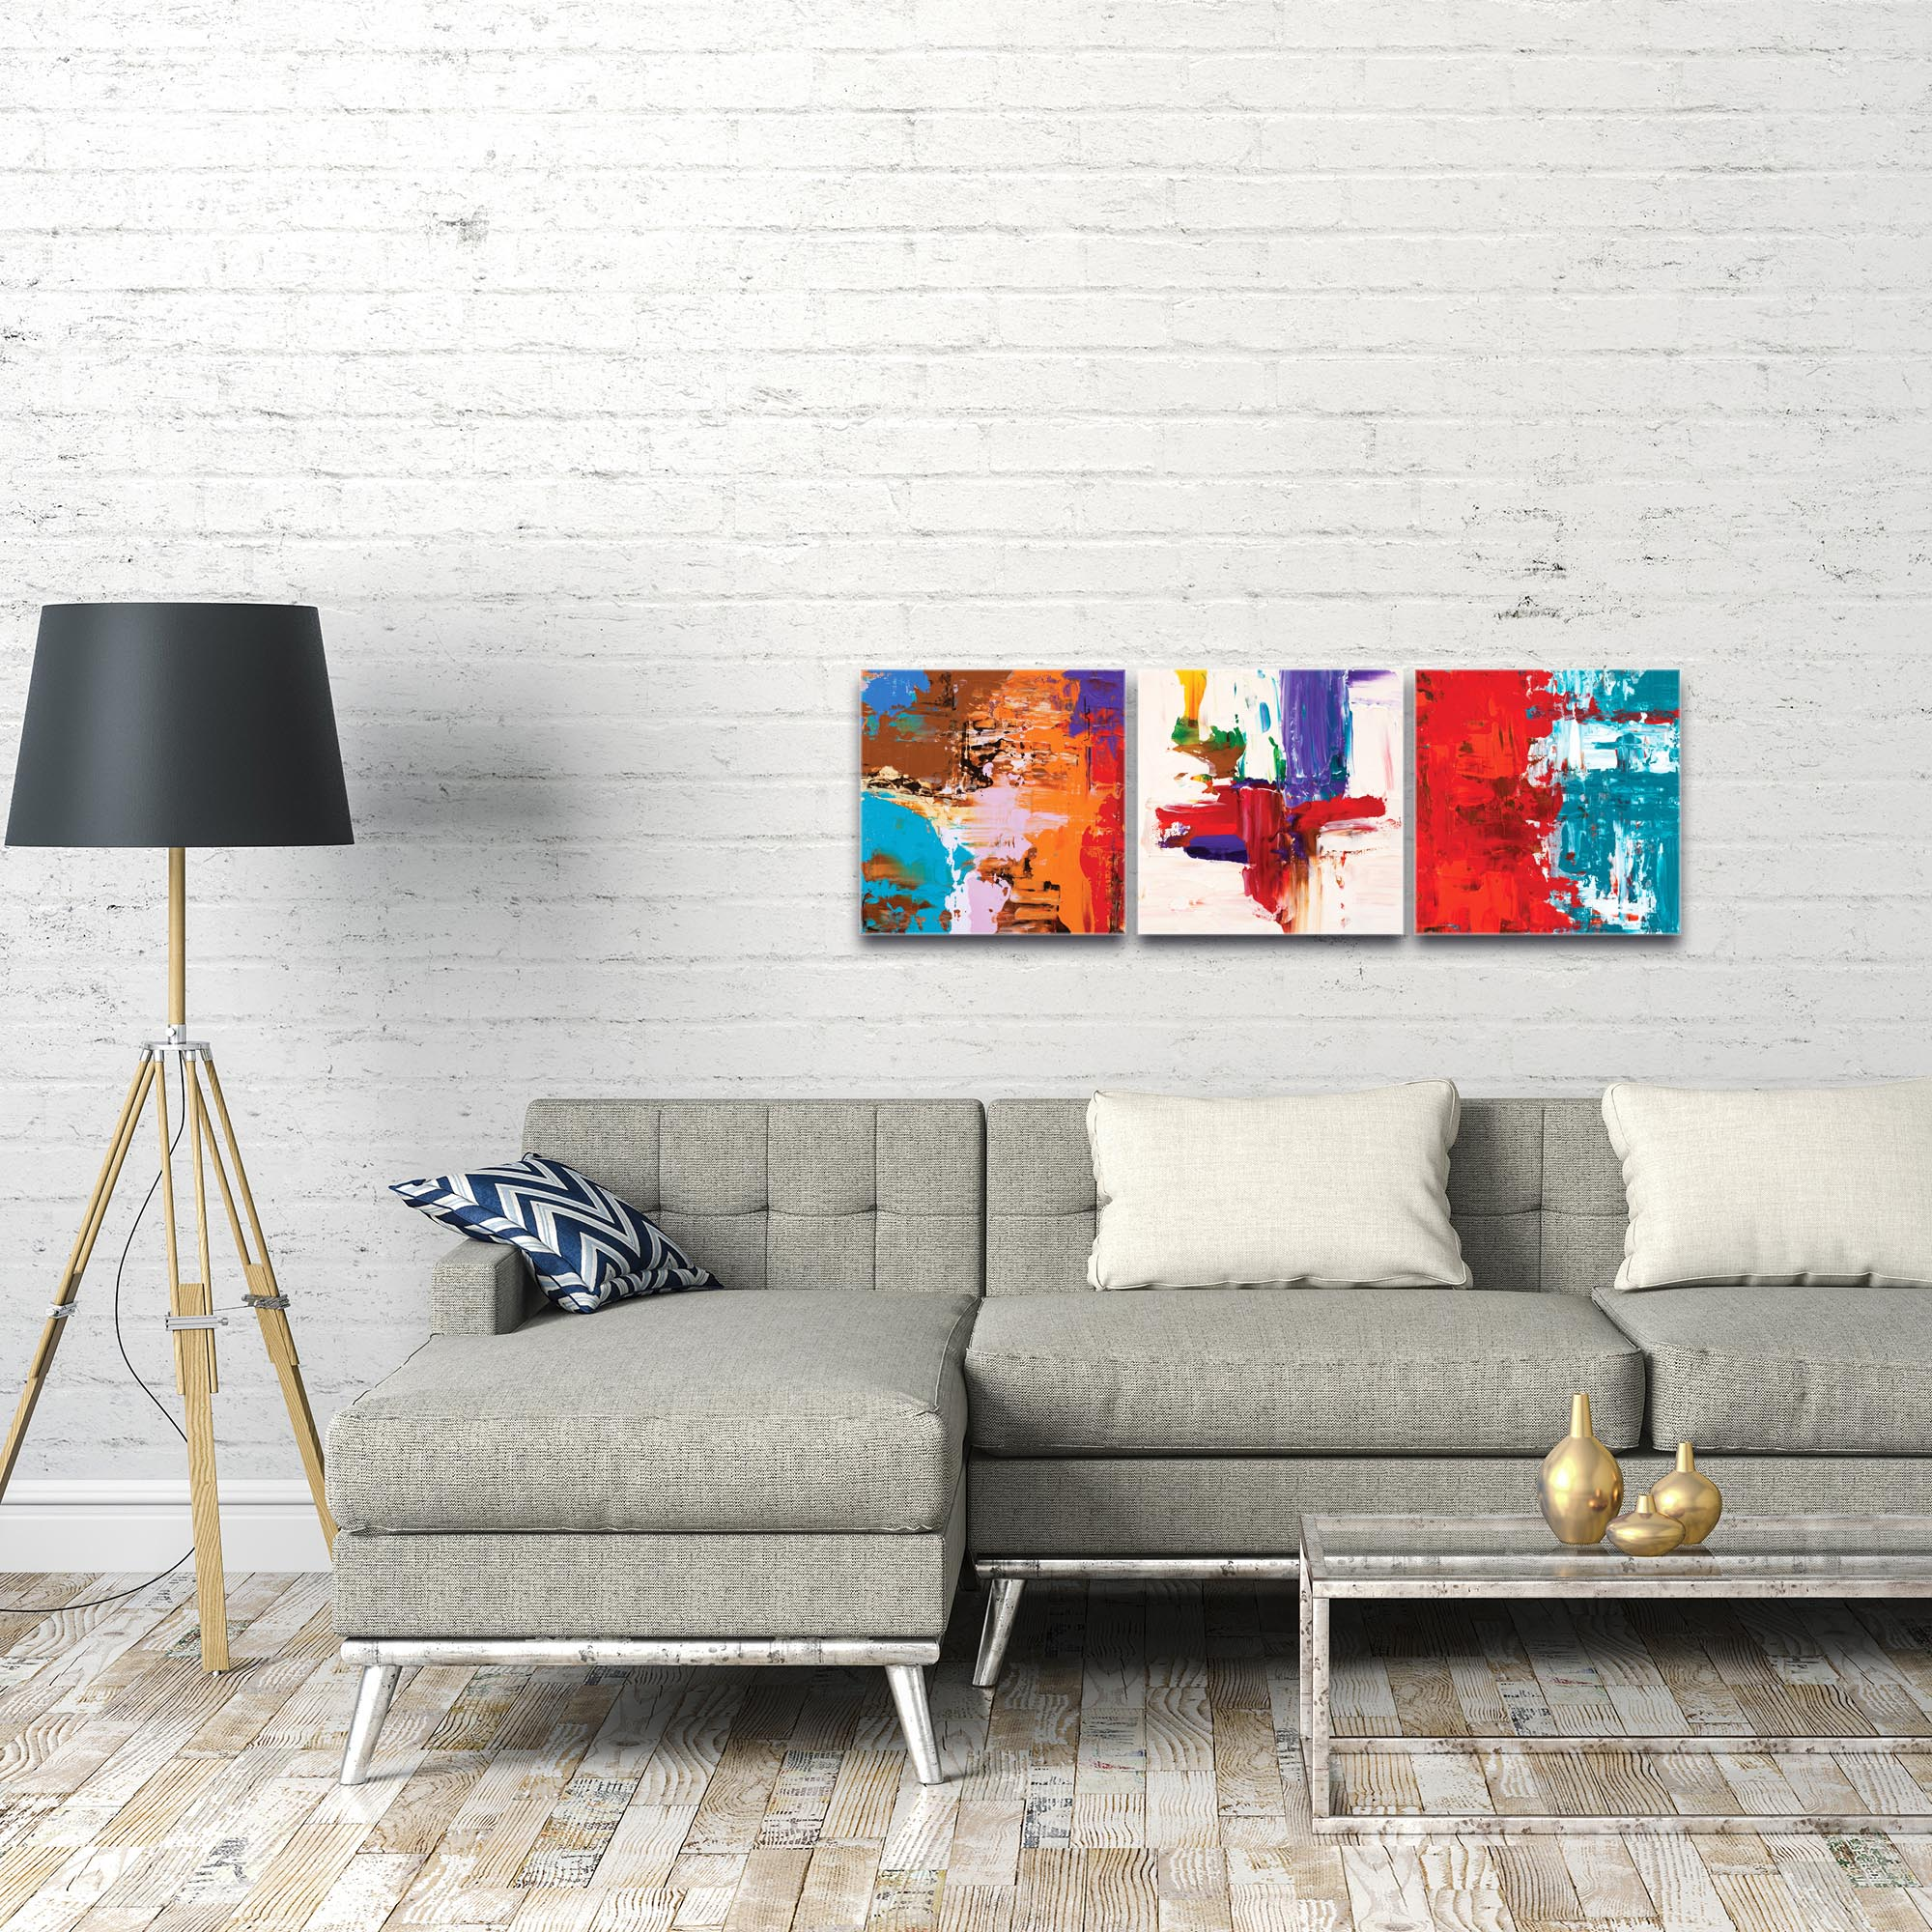 Abstract Wall Art 'Urban Triptych 5' - Urban Decor on Metal or Plexiglass - Image 3